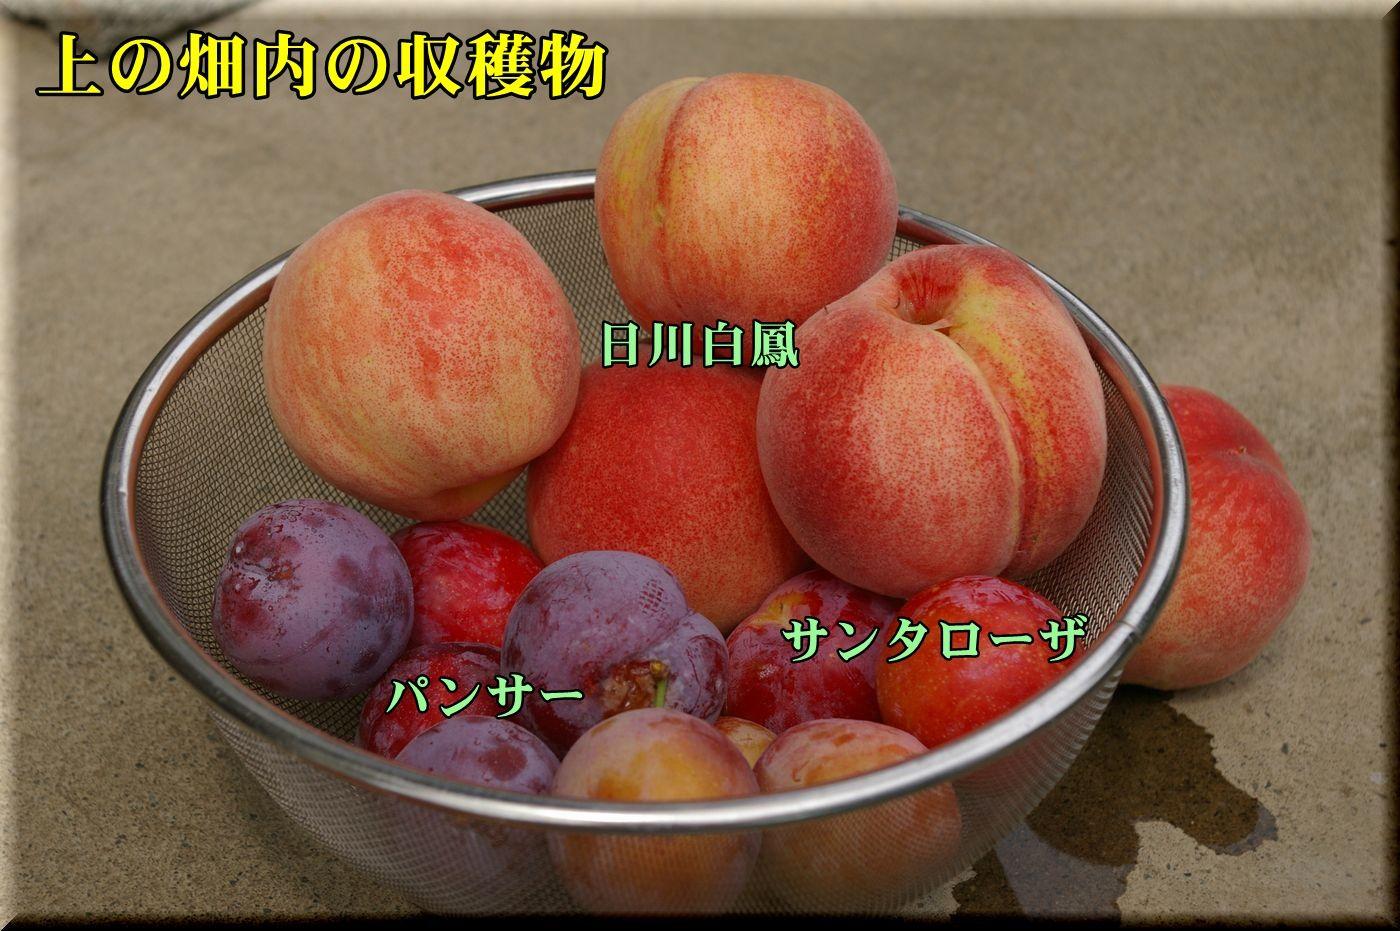 1hikawa_panser160710_030.jpg